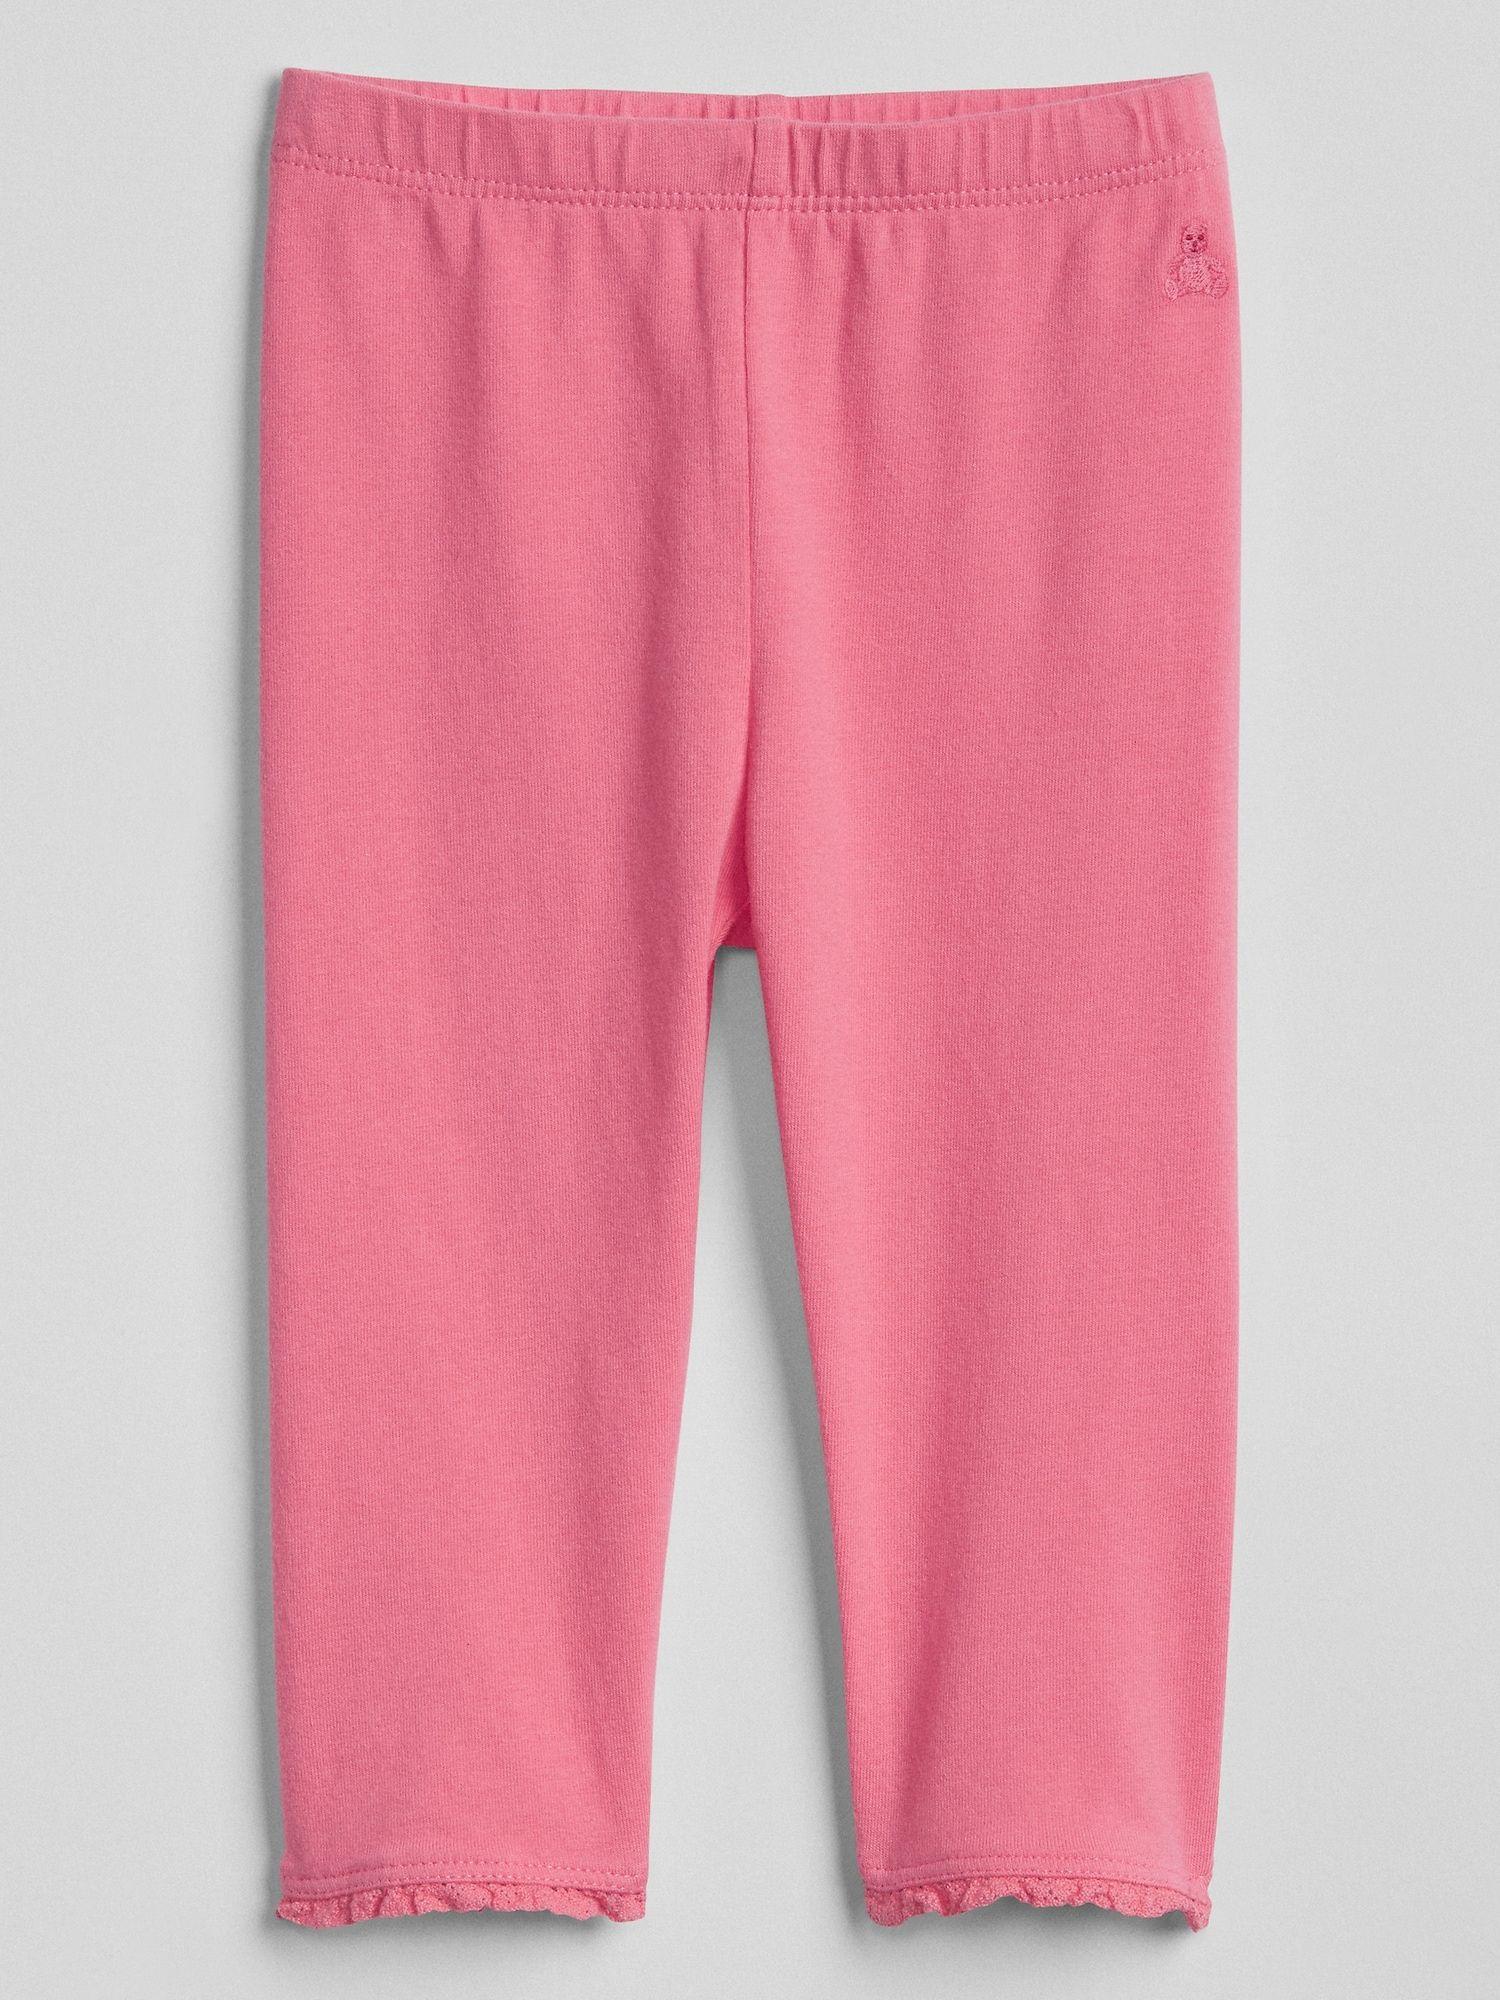 4b8baff28ce3d Baby Lace-Trim Leggings   Baby P   Lace trim, Pink leggings, Leggings